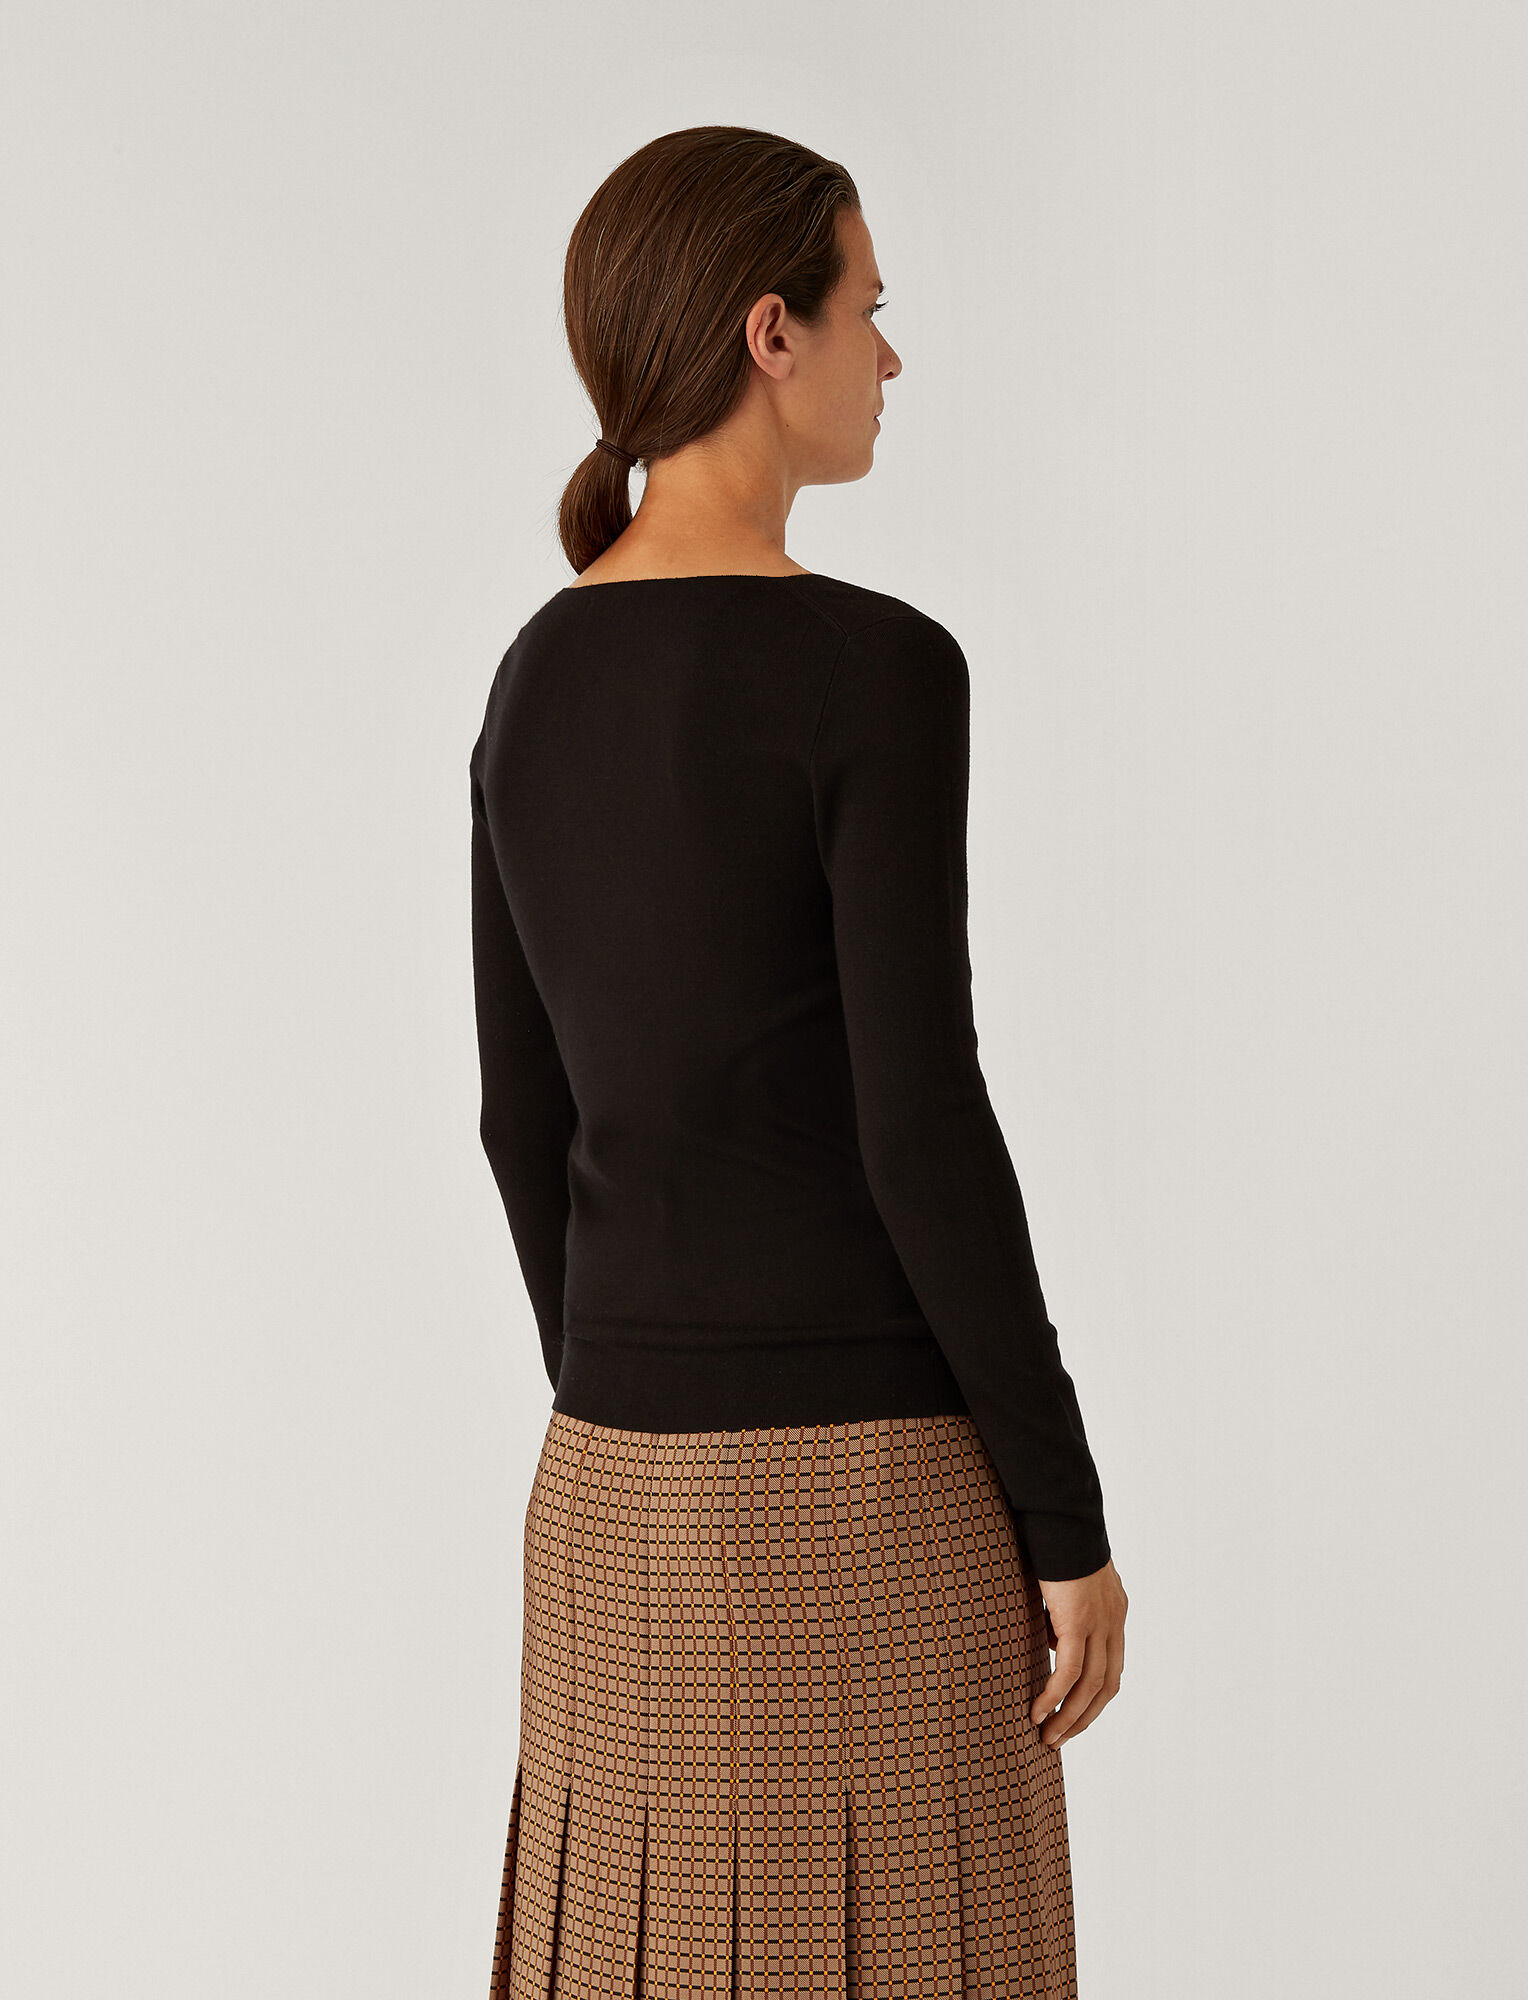 Joseph, V Neck Silk Stretch Knit, in BLACK